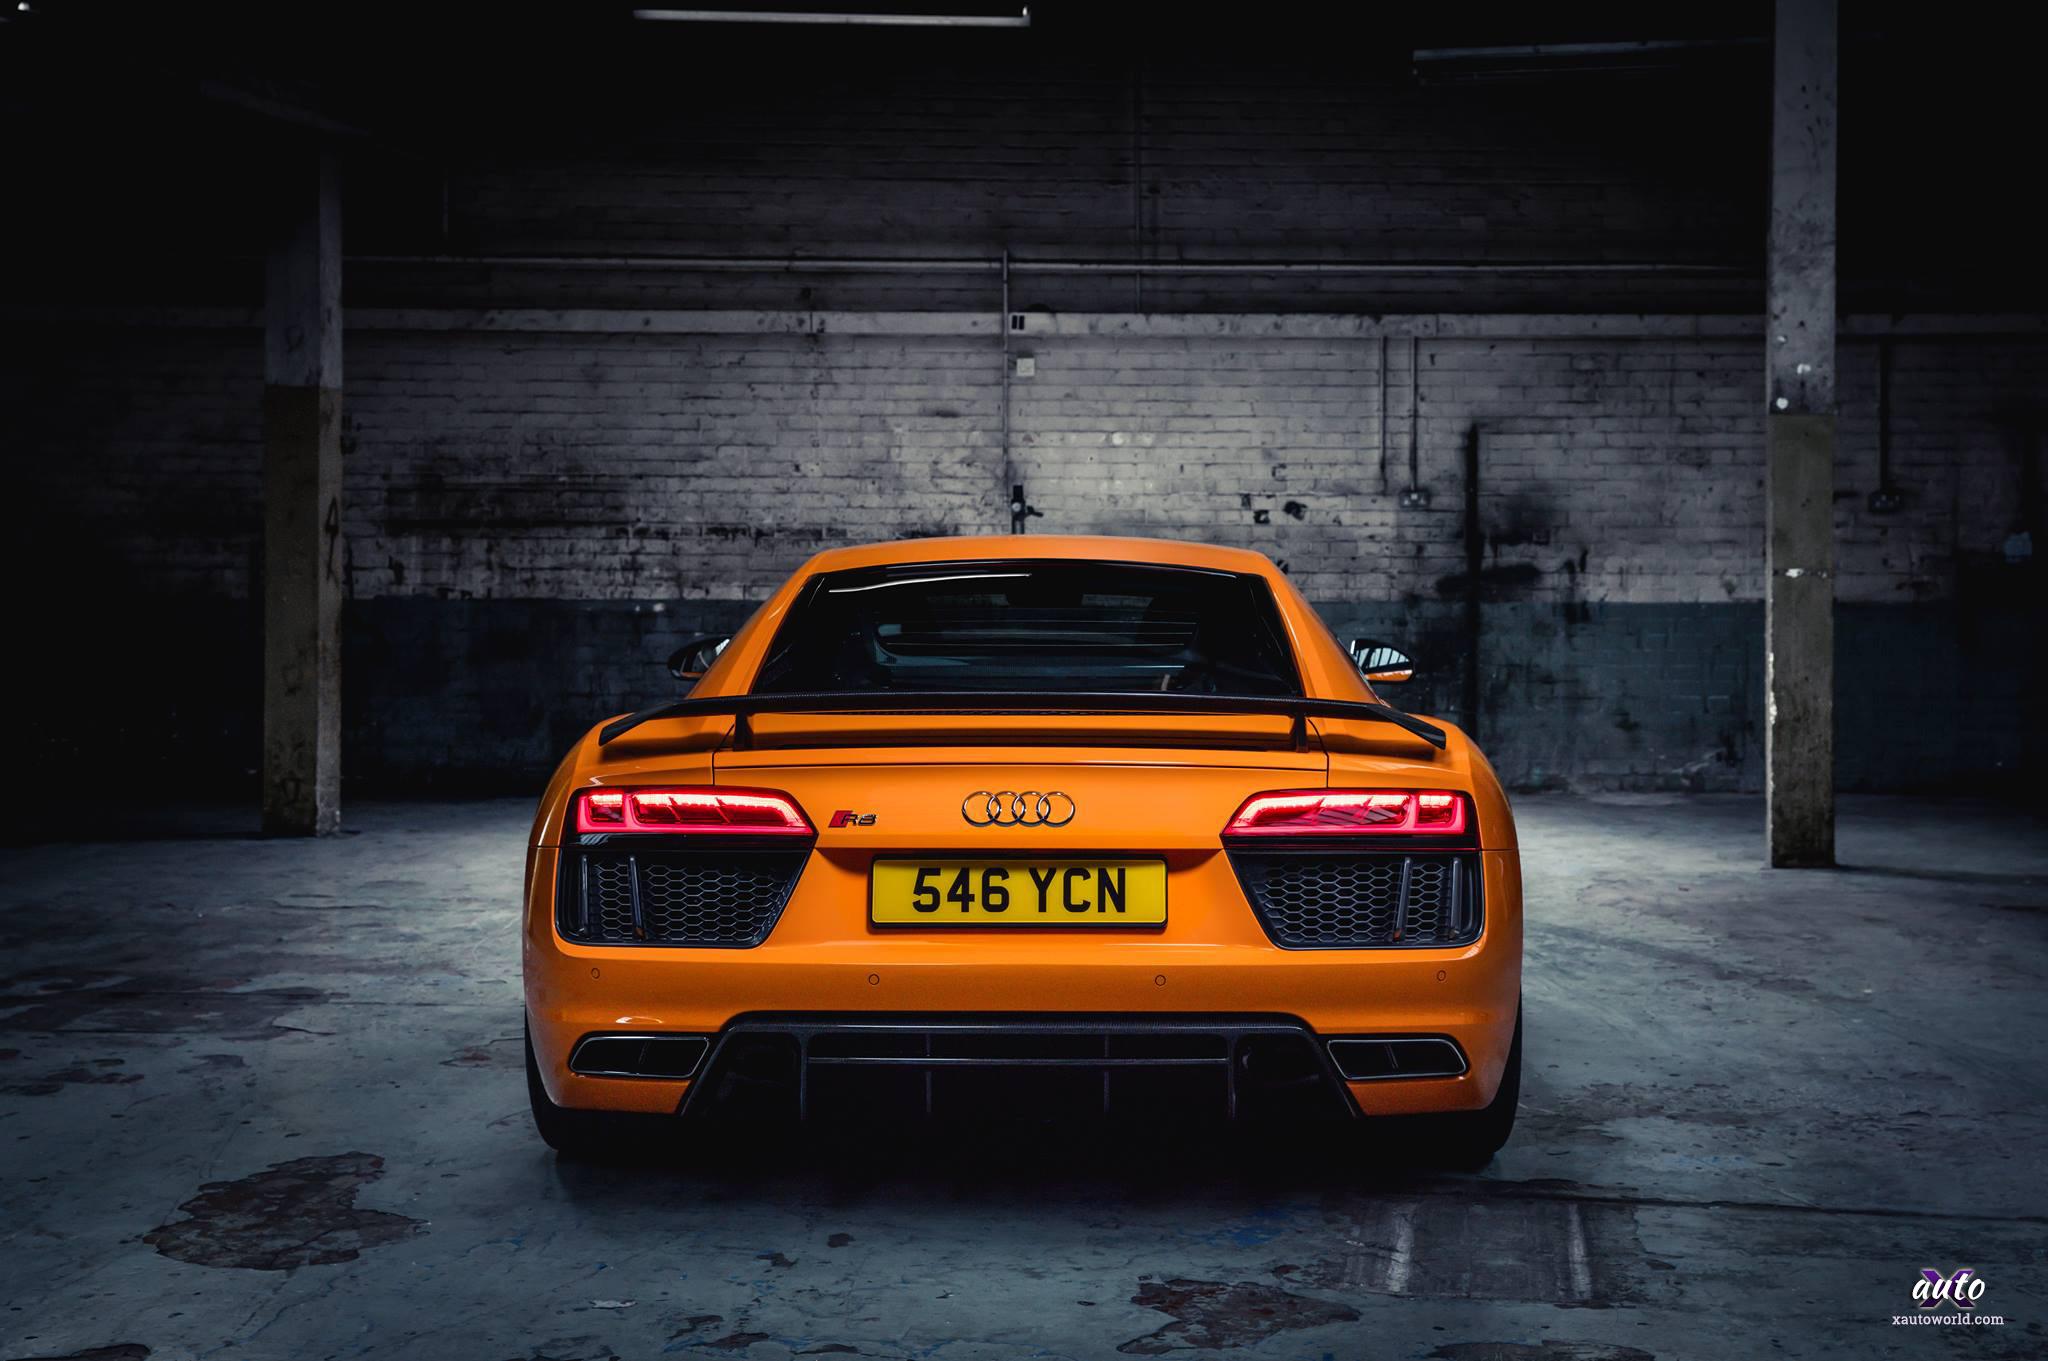 Audi R8 Orange Colour Hd Wallpapers X Auto